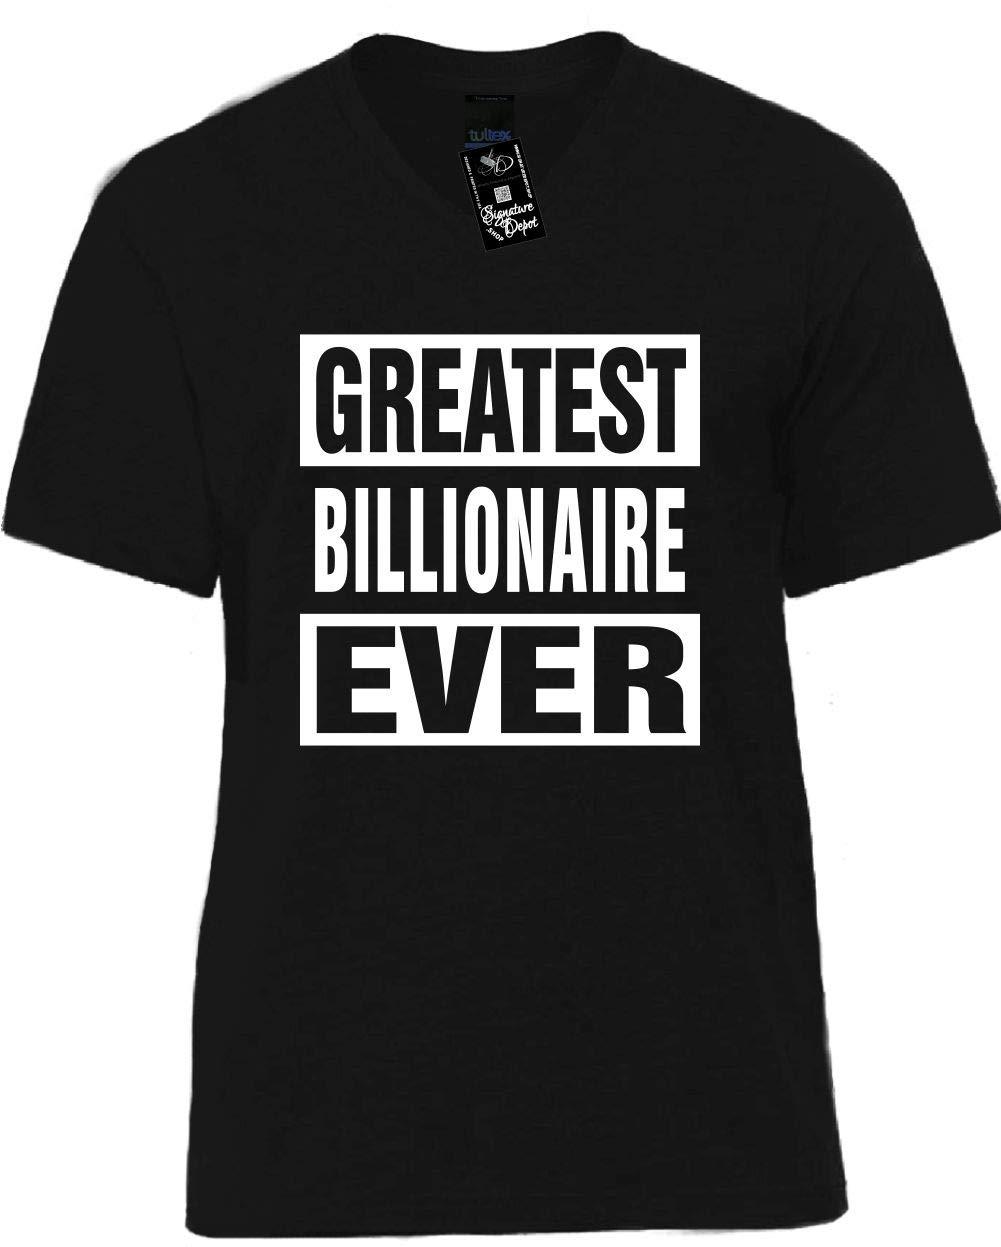 Signature Depot S Funny Vneck Tshirt Unisex Tee Greatest Billionaire Ever